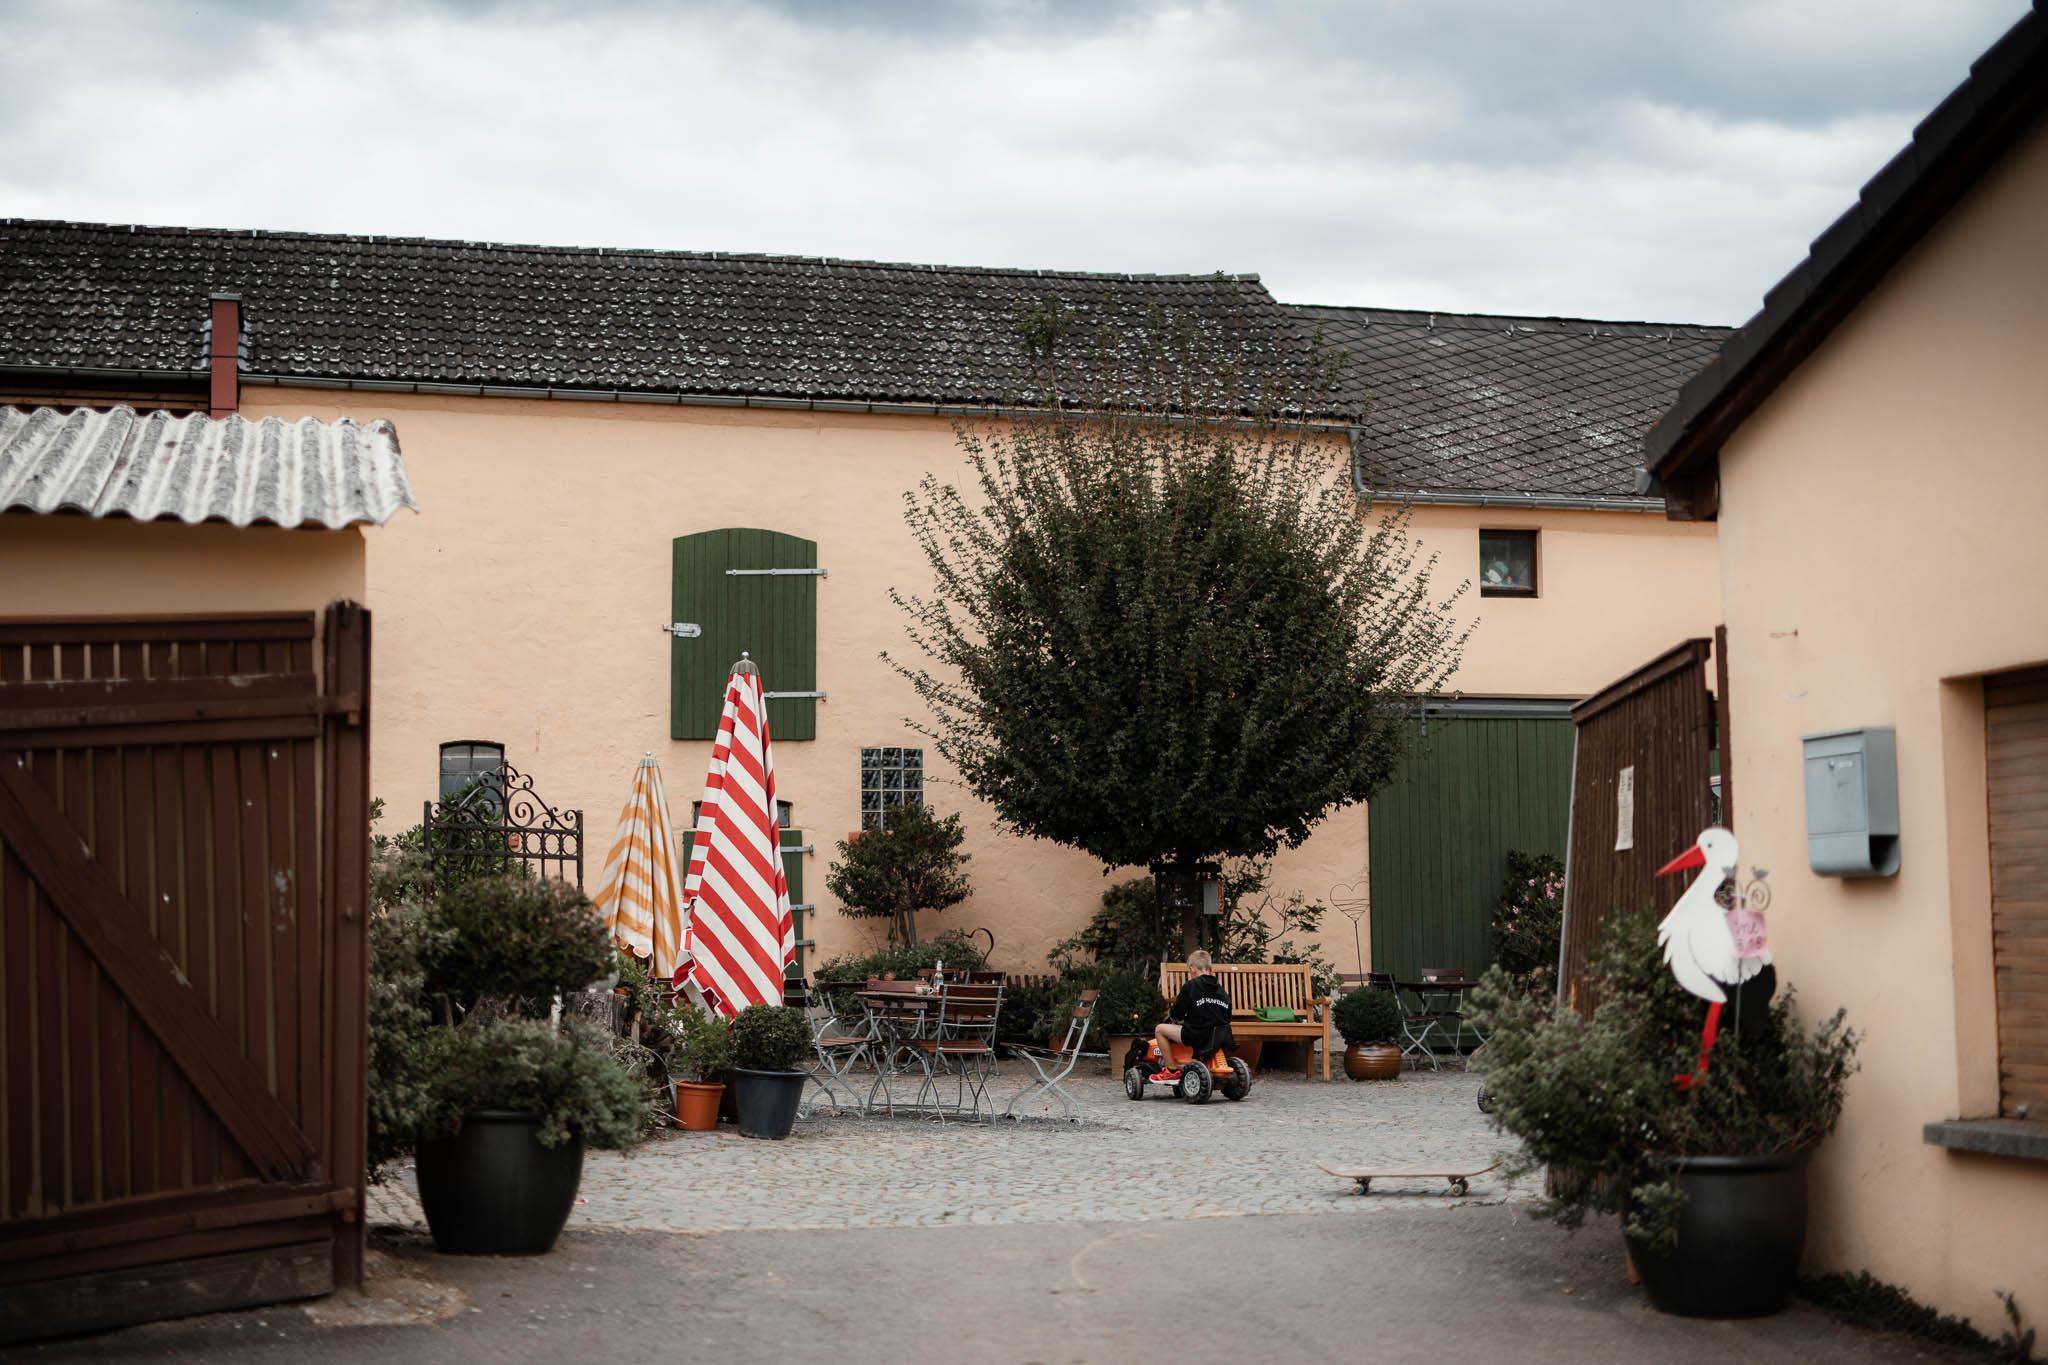 Hochzeitsfotograf Limburg an der Lahn 2